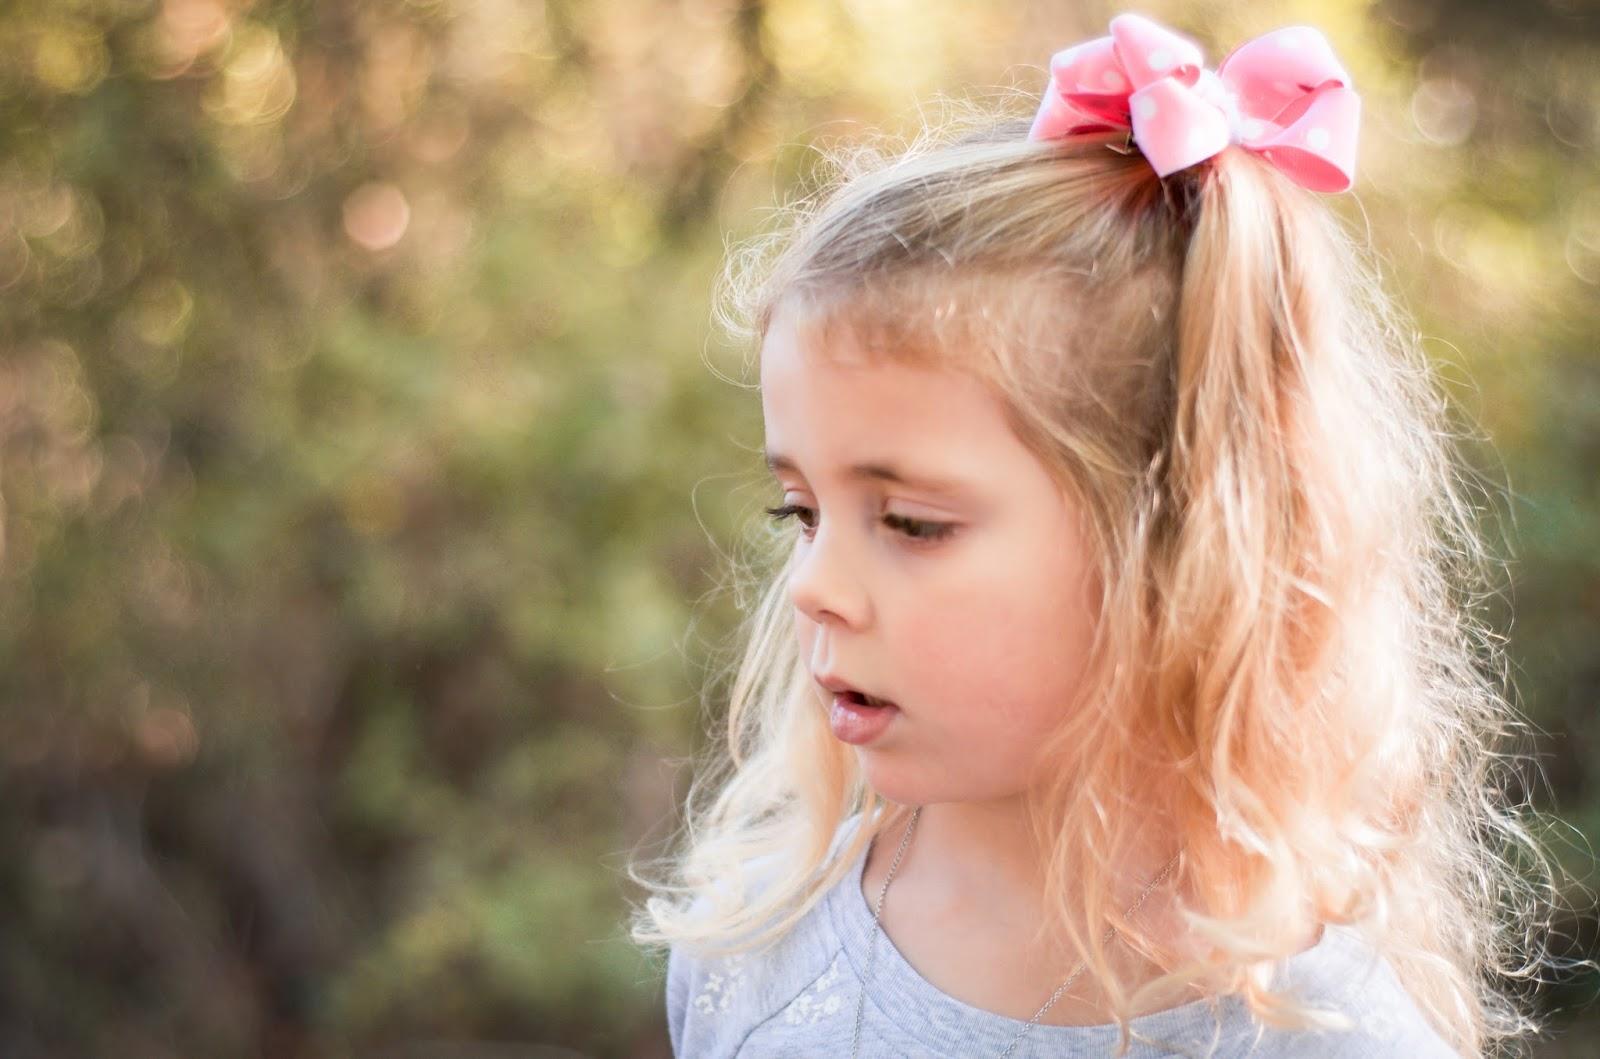 Equita 2018 Cindy crawford children photos